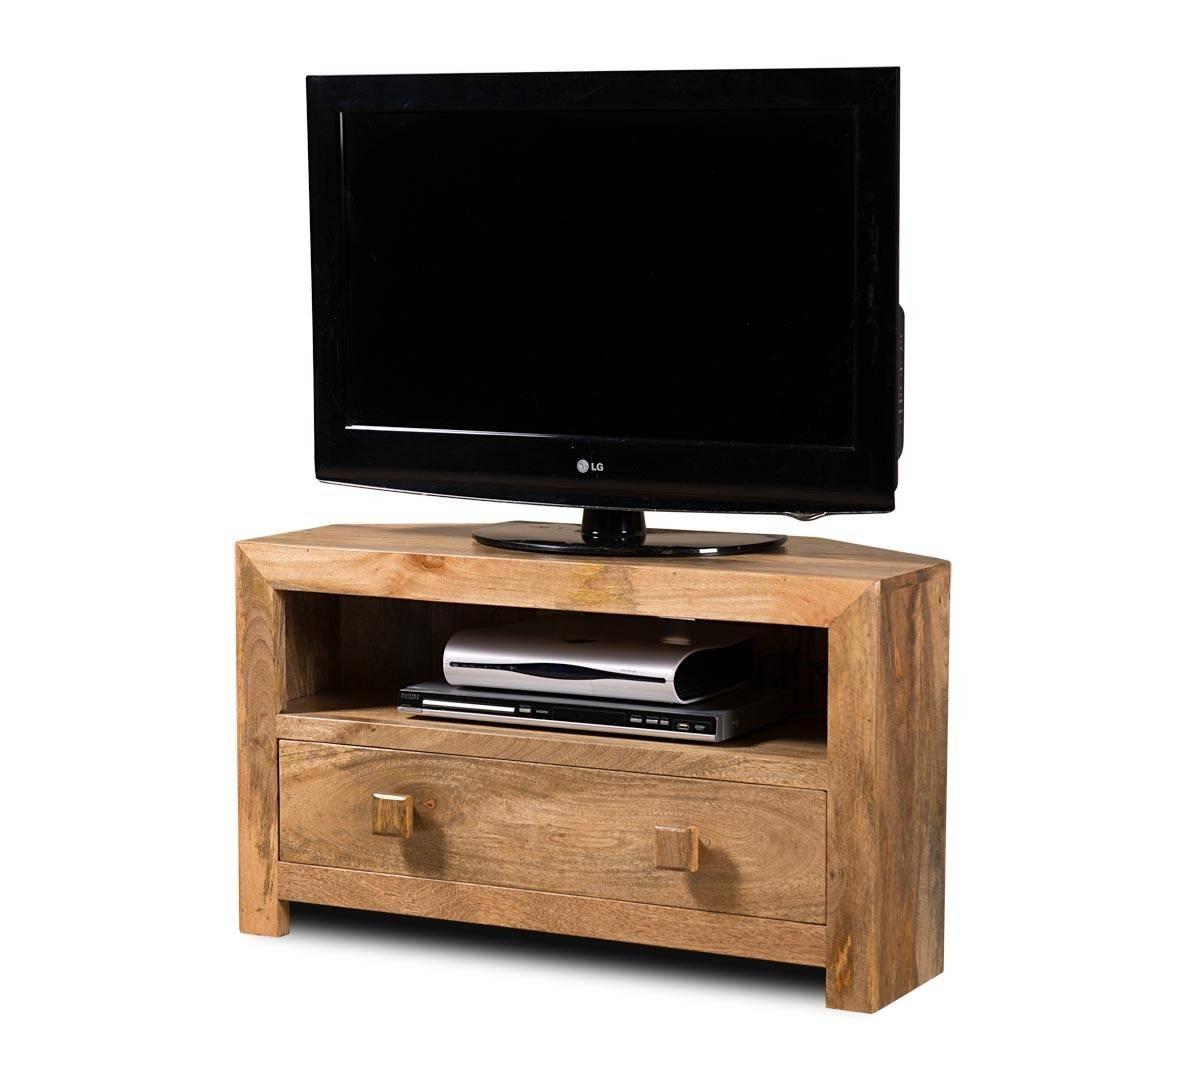 Dakota Light Mango Small Corner Tv Stand | Casa Bella Furniture Uk with Wood Corner Tv Cabinets (Image 5 of 15)